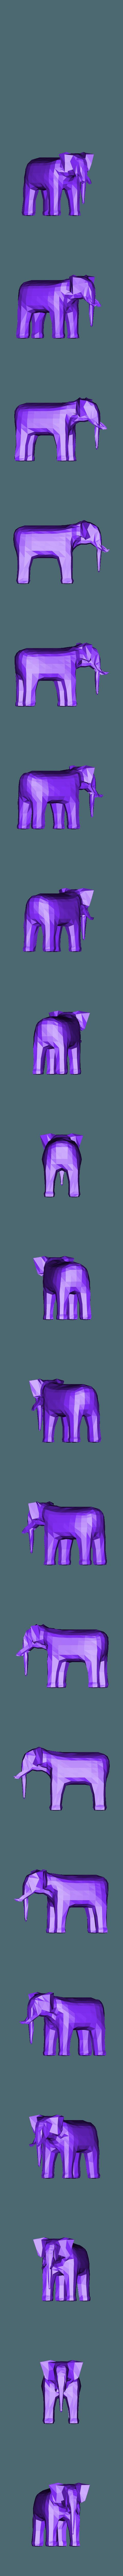 elephant.stl Download free STL file Elephant • 3D printing object, Sammy3